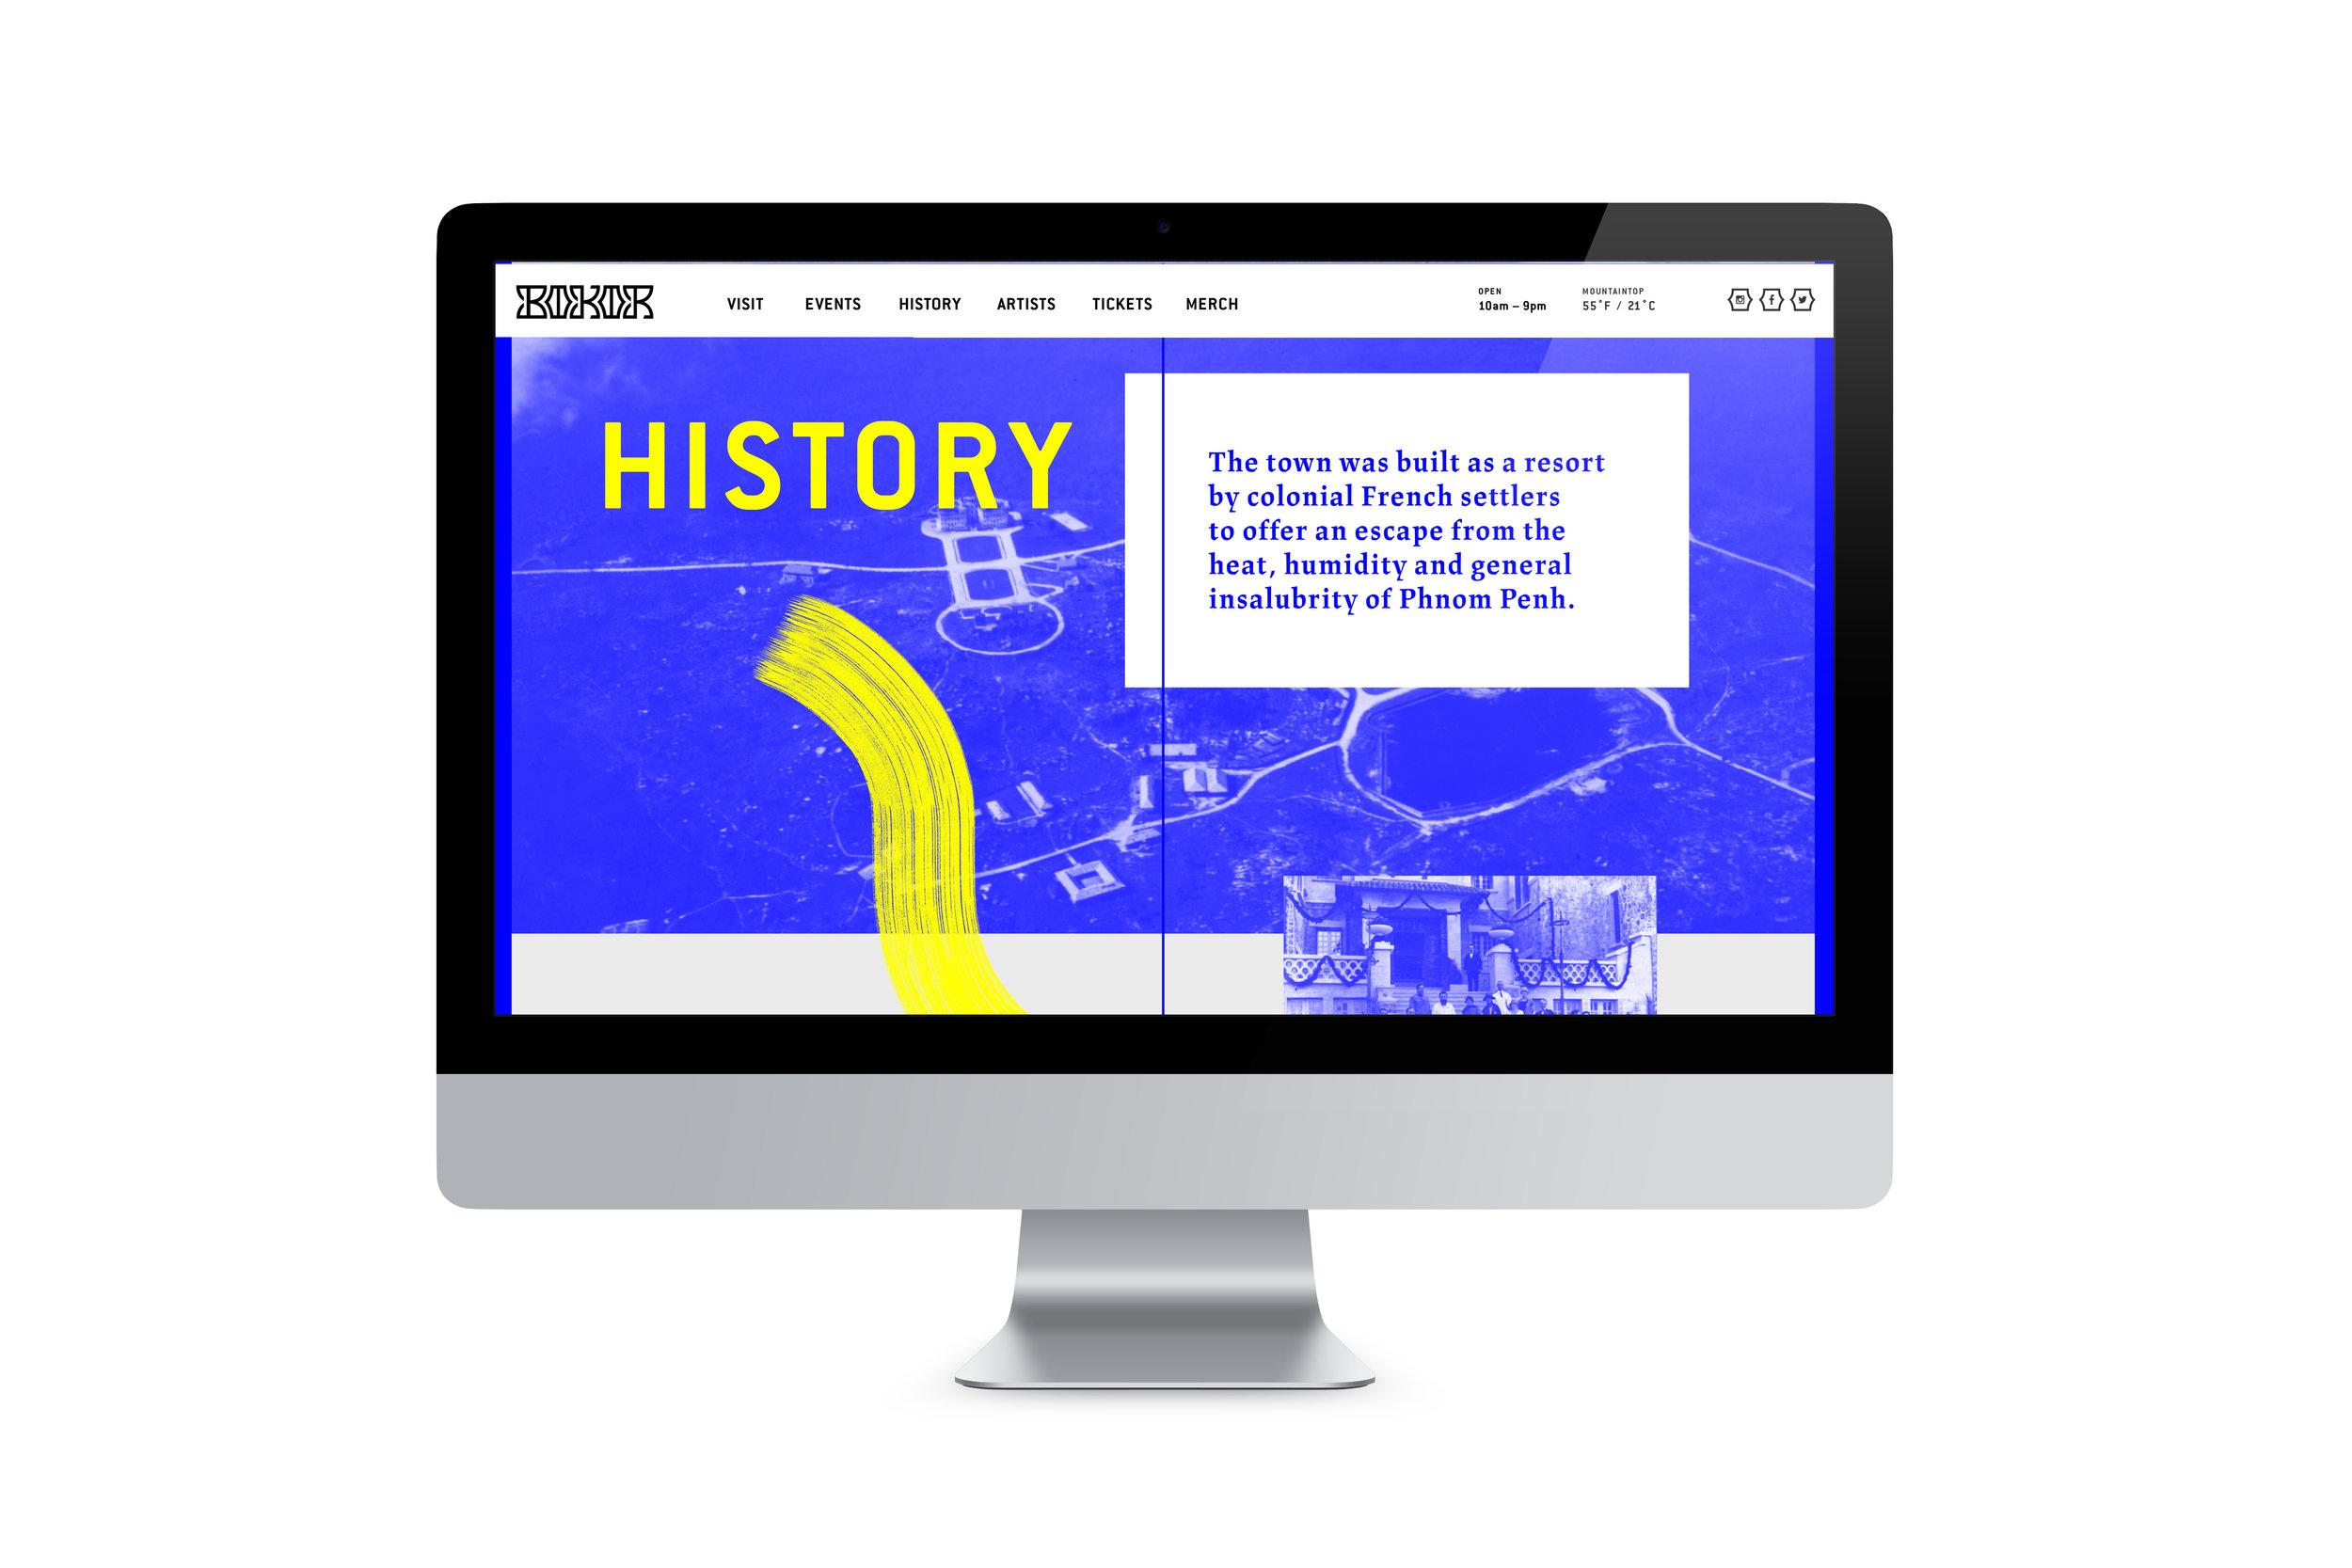 bokor-desktop_history.jpg